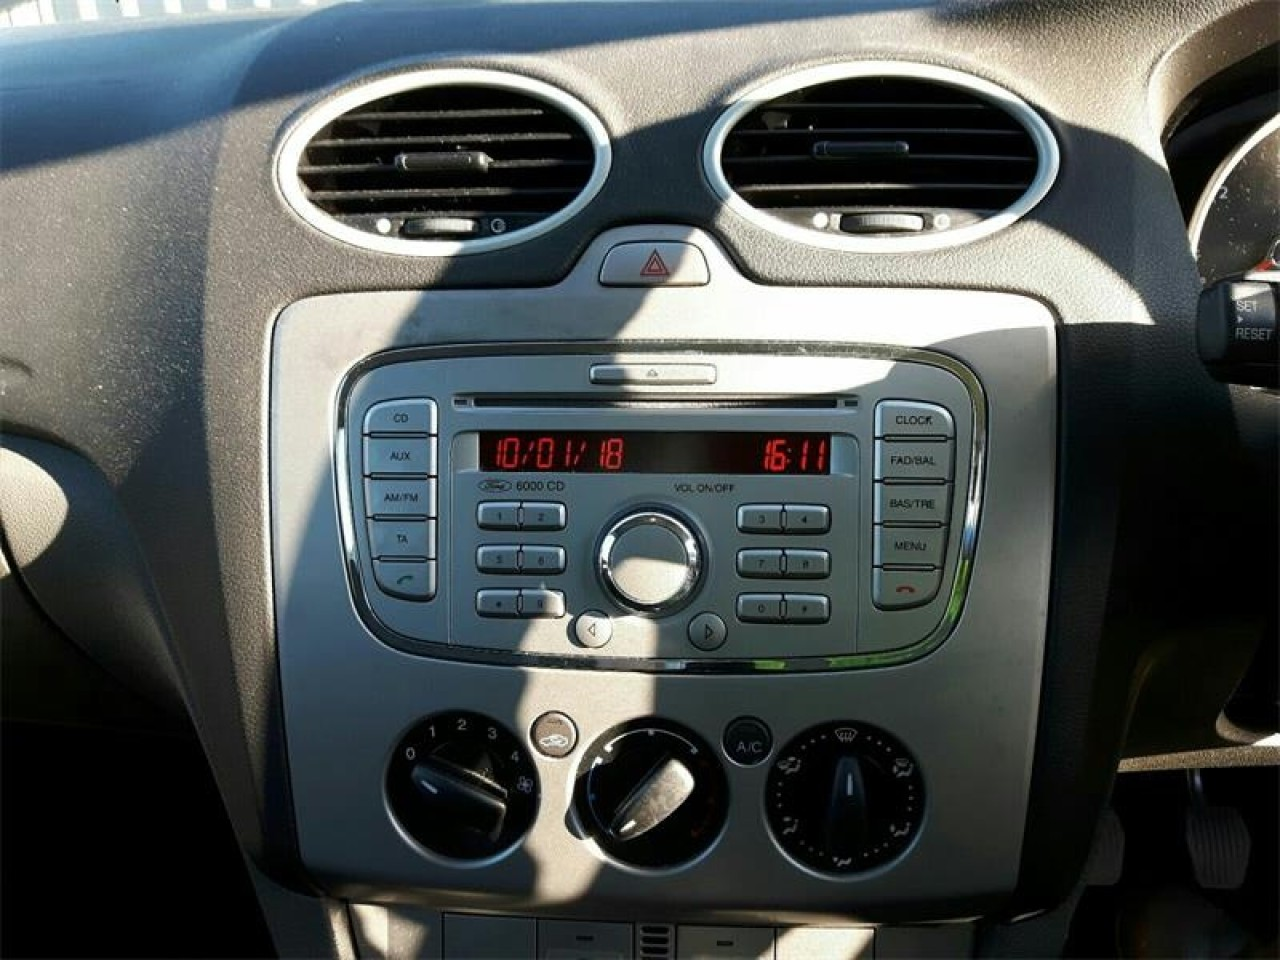 Set arcuri fata Ford Focus 2008 Hatchback 1.6 TDCi